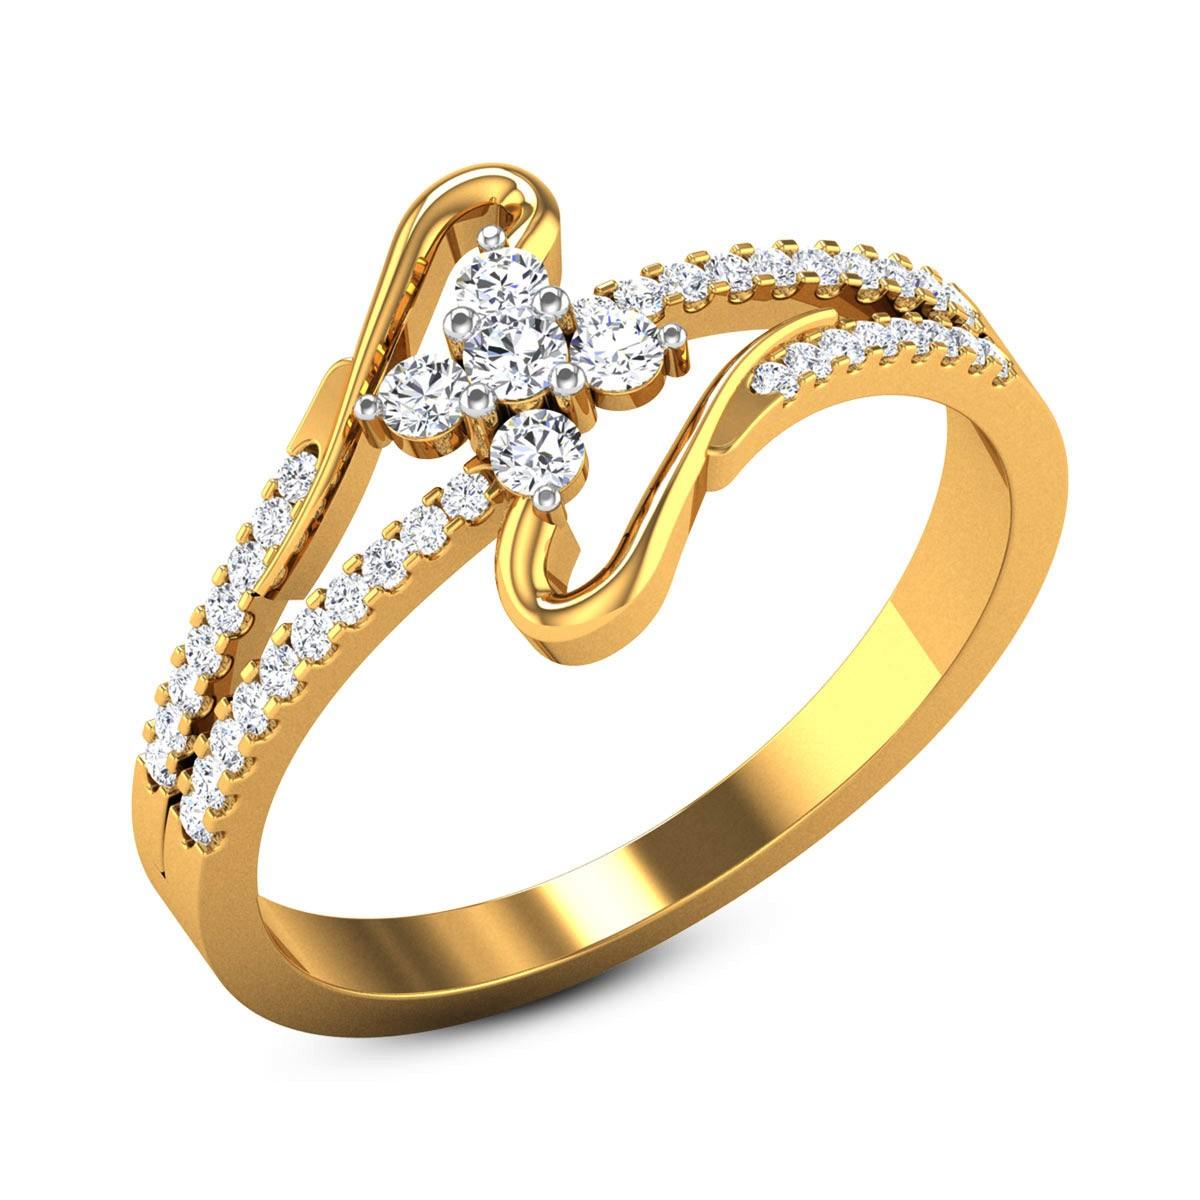 Kirk Diamond Floral Ring